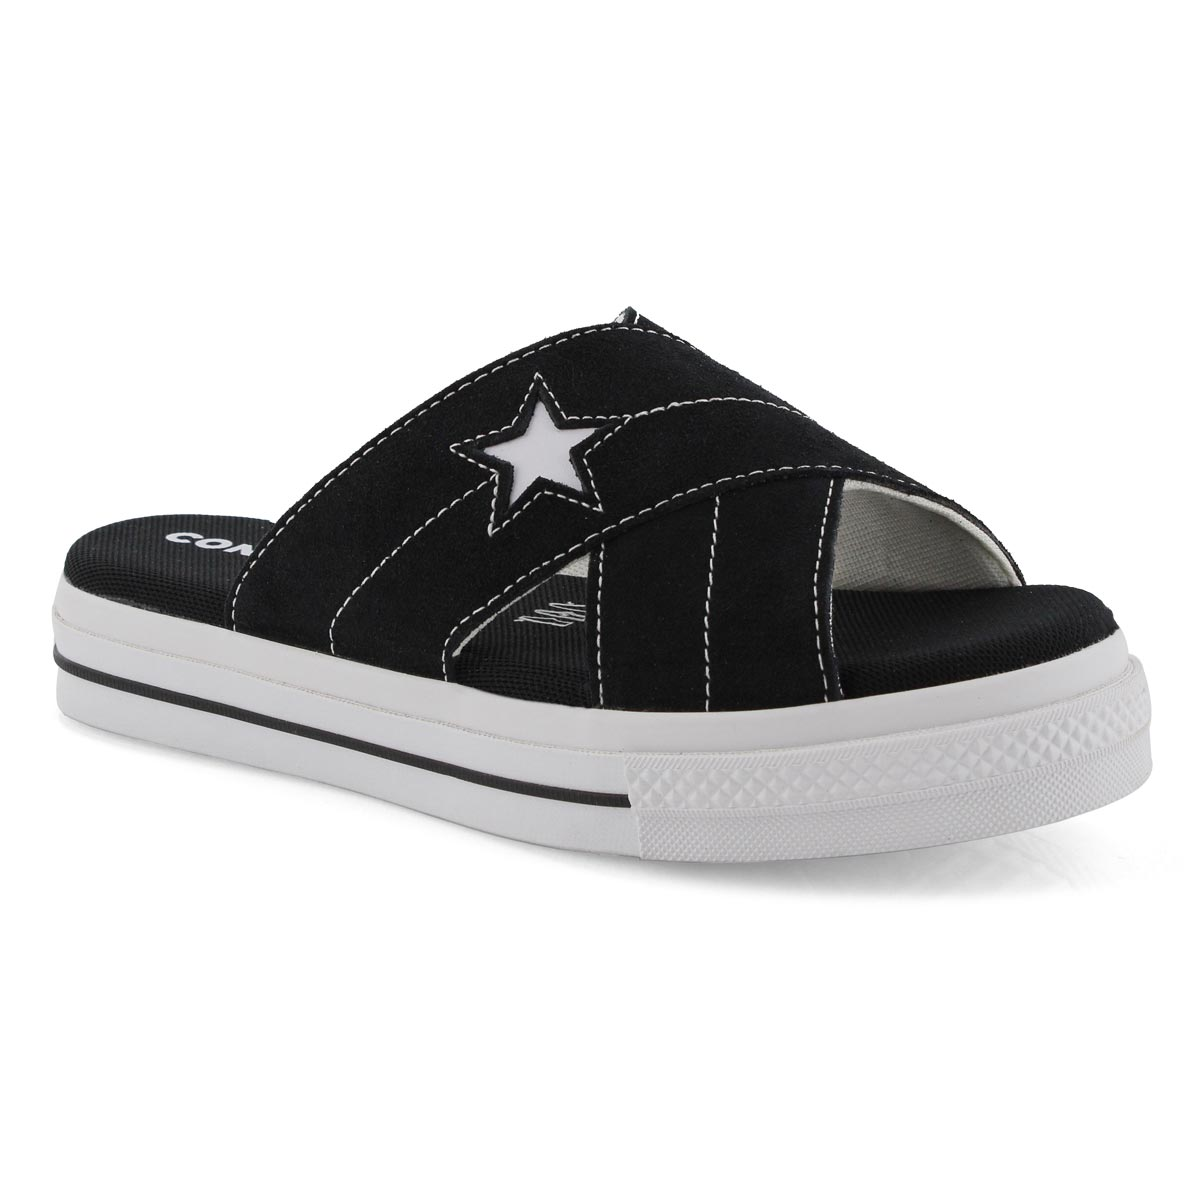 Lds One Star blk casual slide sandal